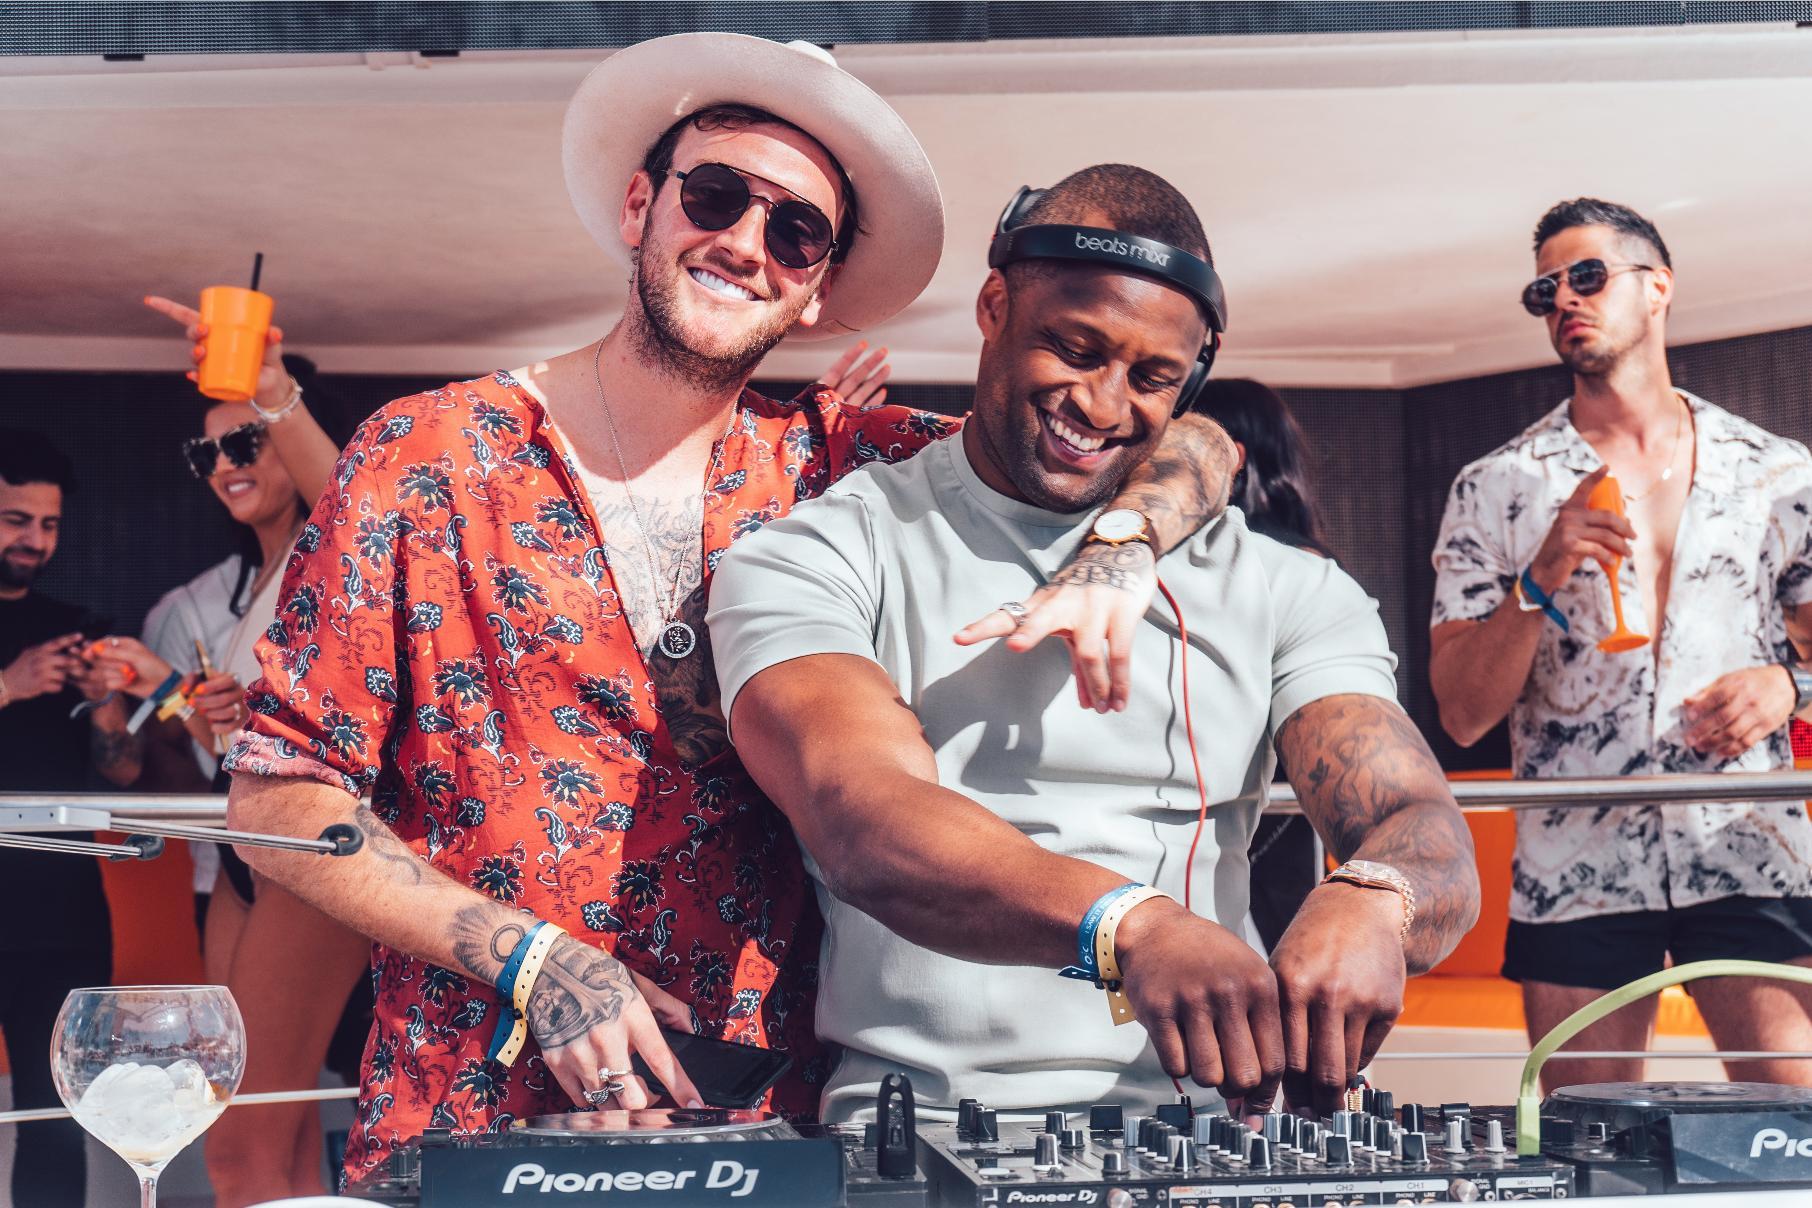 Playa Day Club DJs